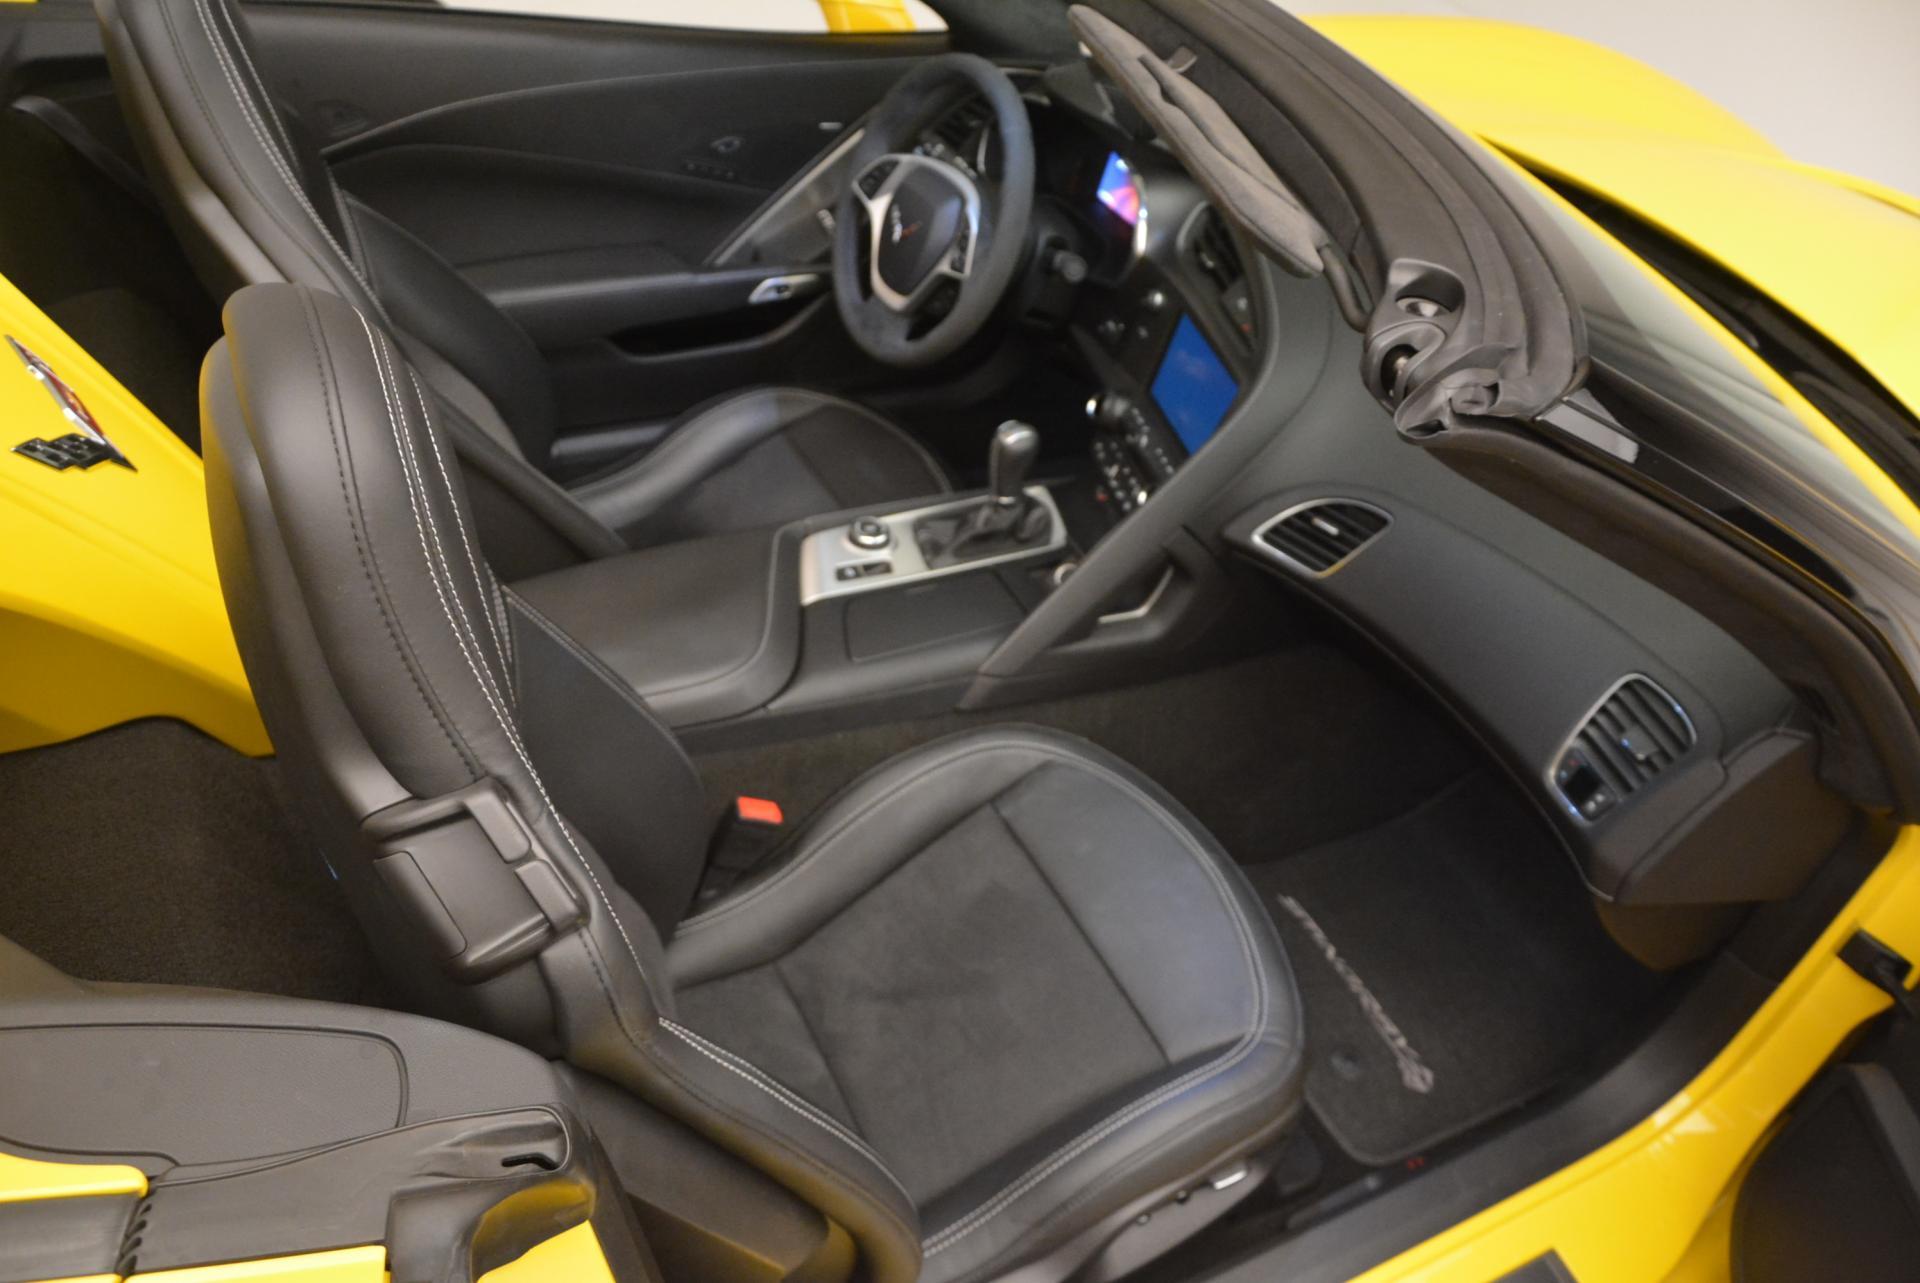 Used 2014 Chevrolet Corvette Stingray Z51 For Sale 0 In Greenwich, CT